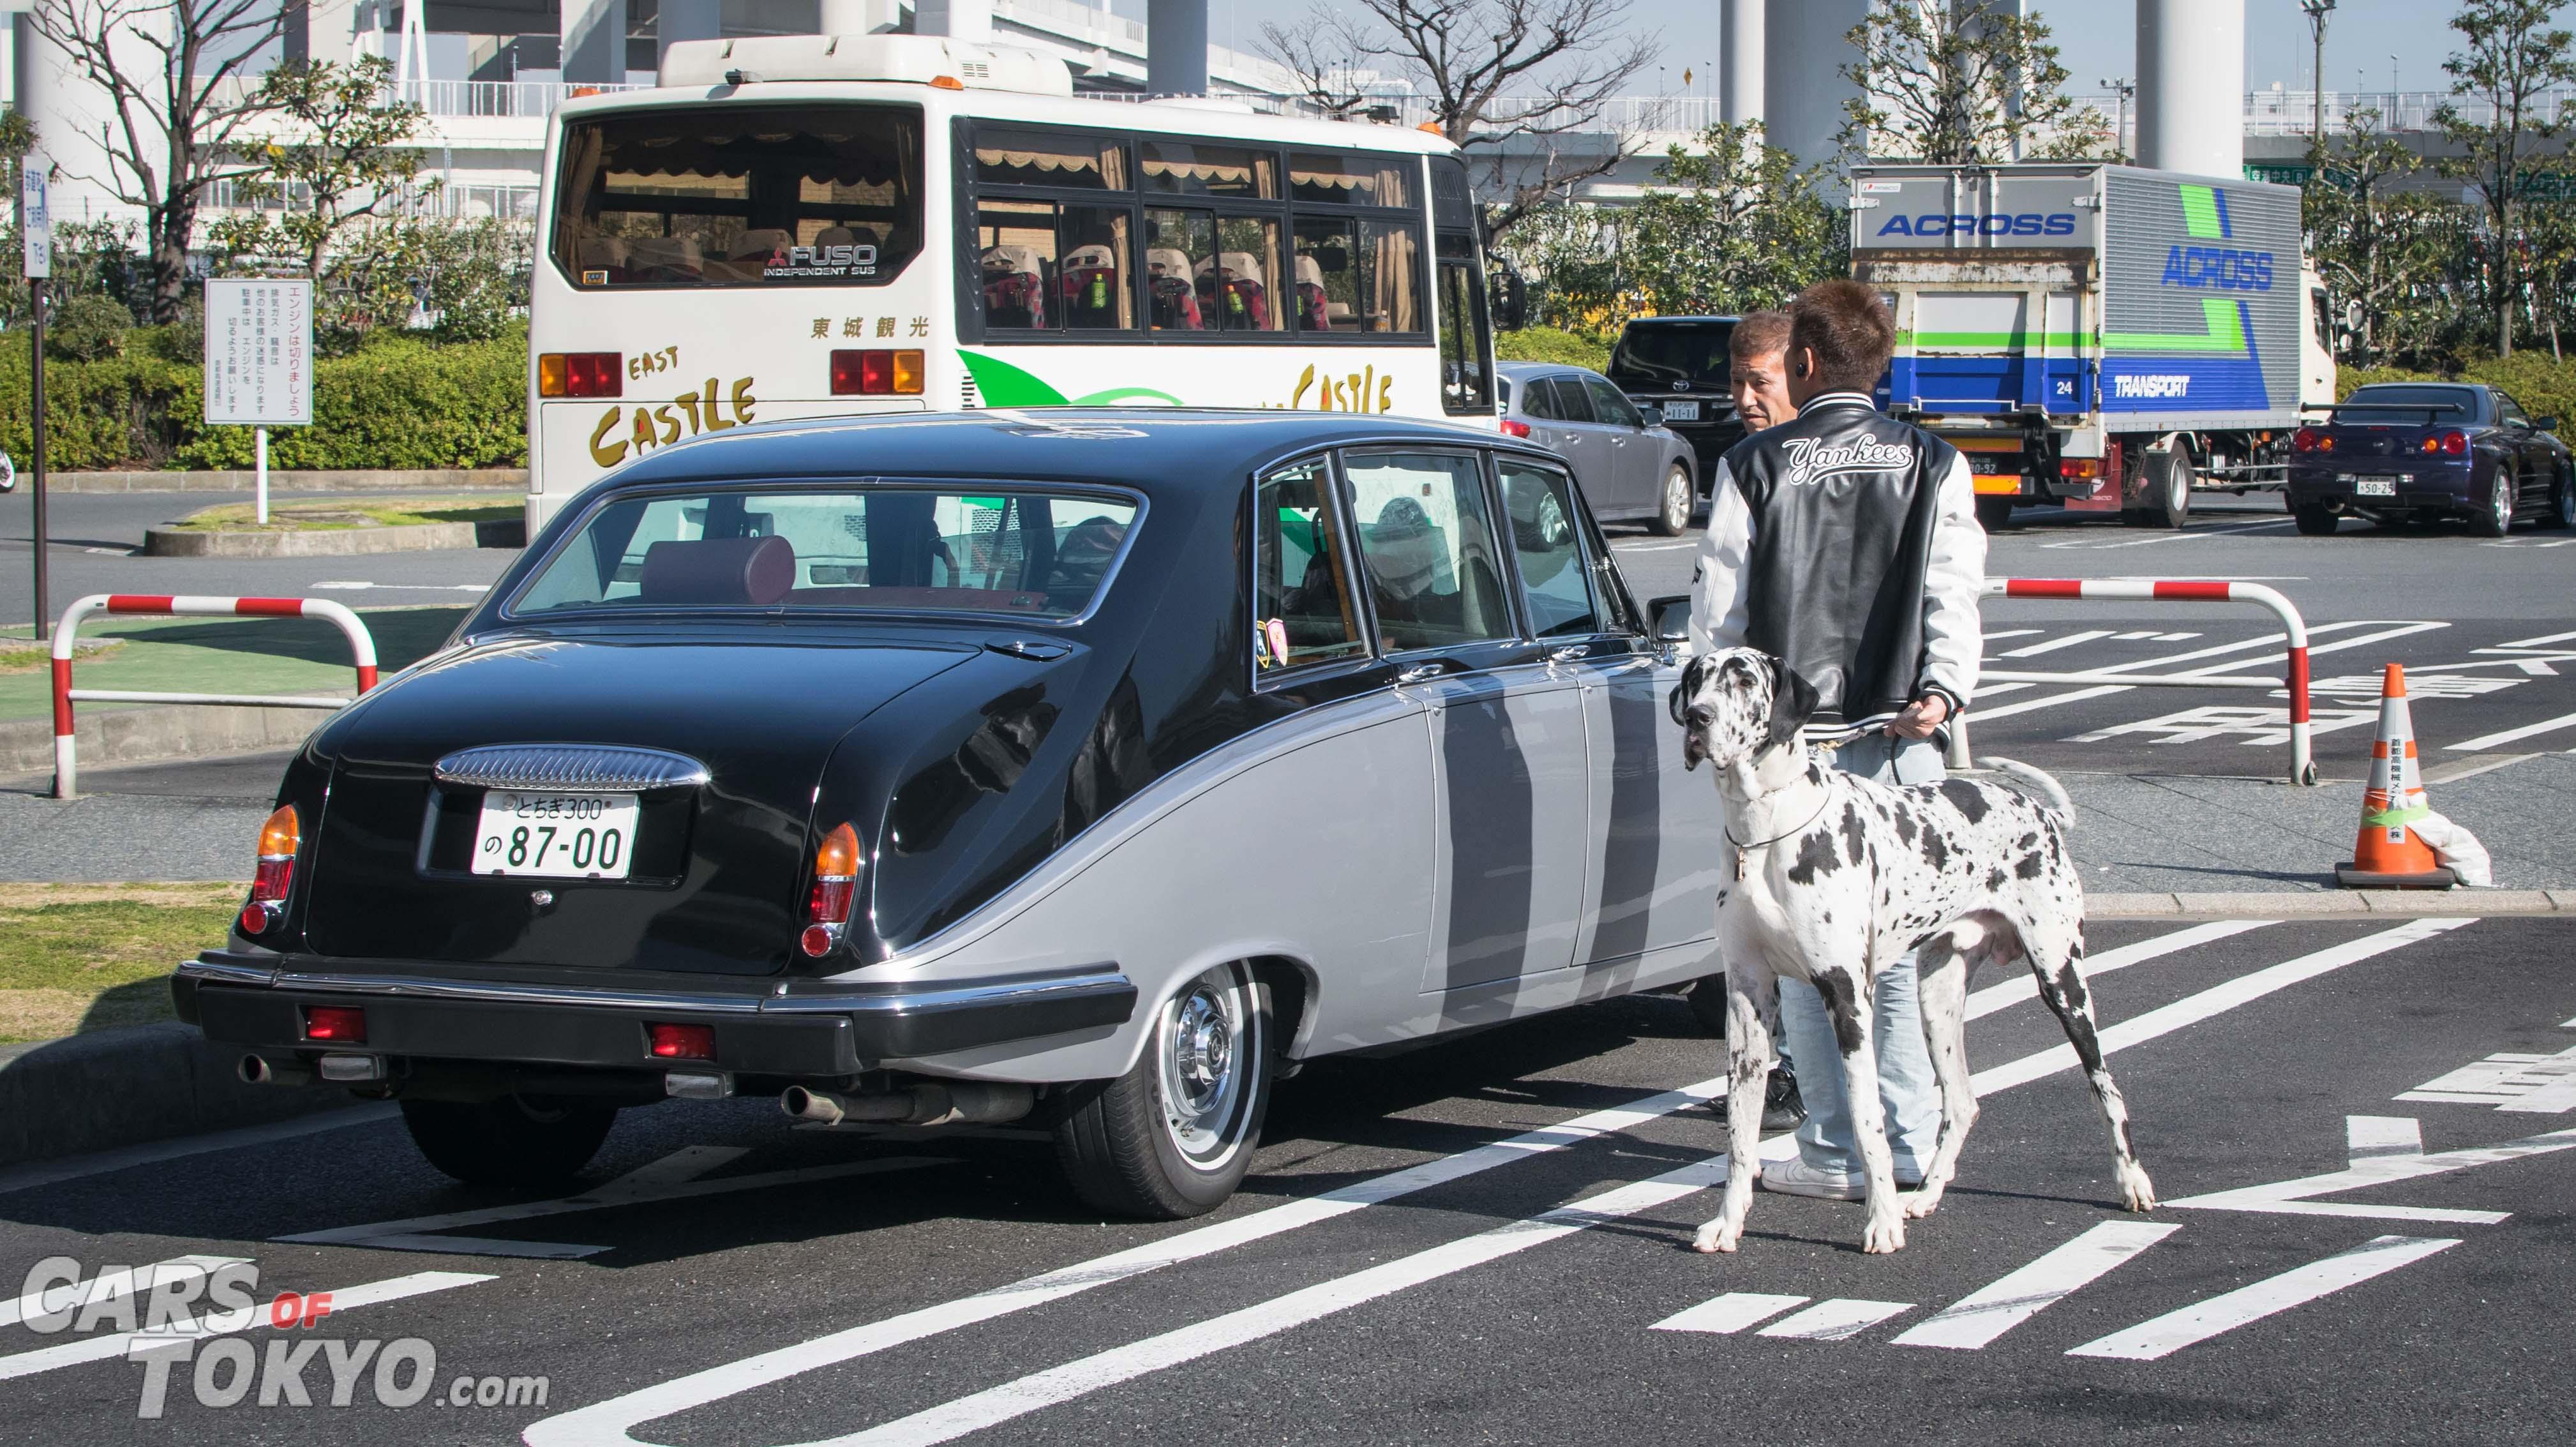 cars-of-tokyo-luxury-daimler-dalmatian